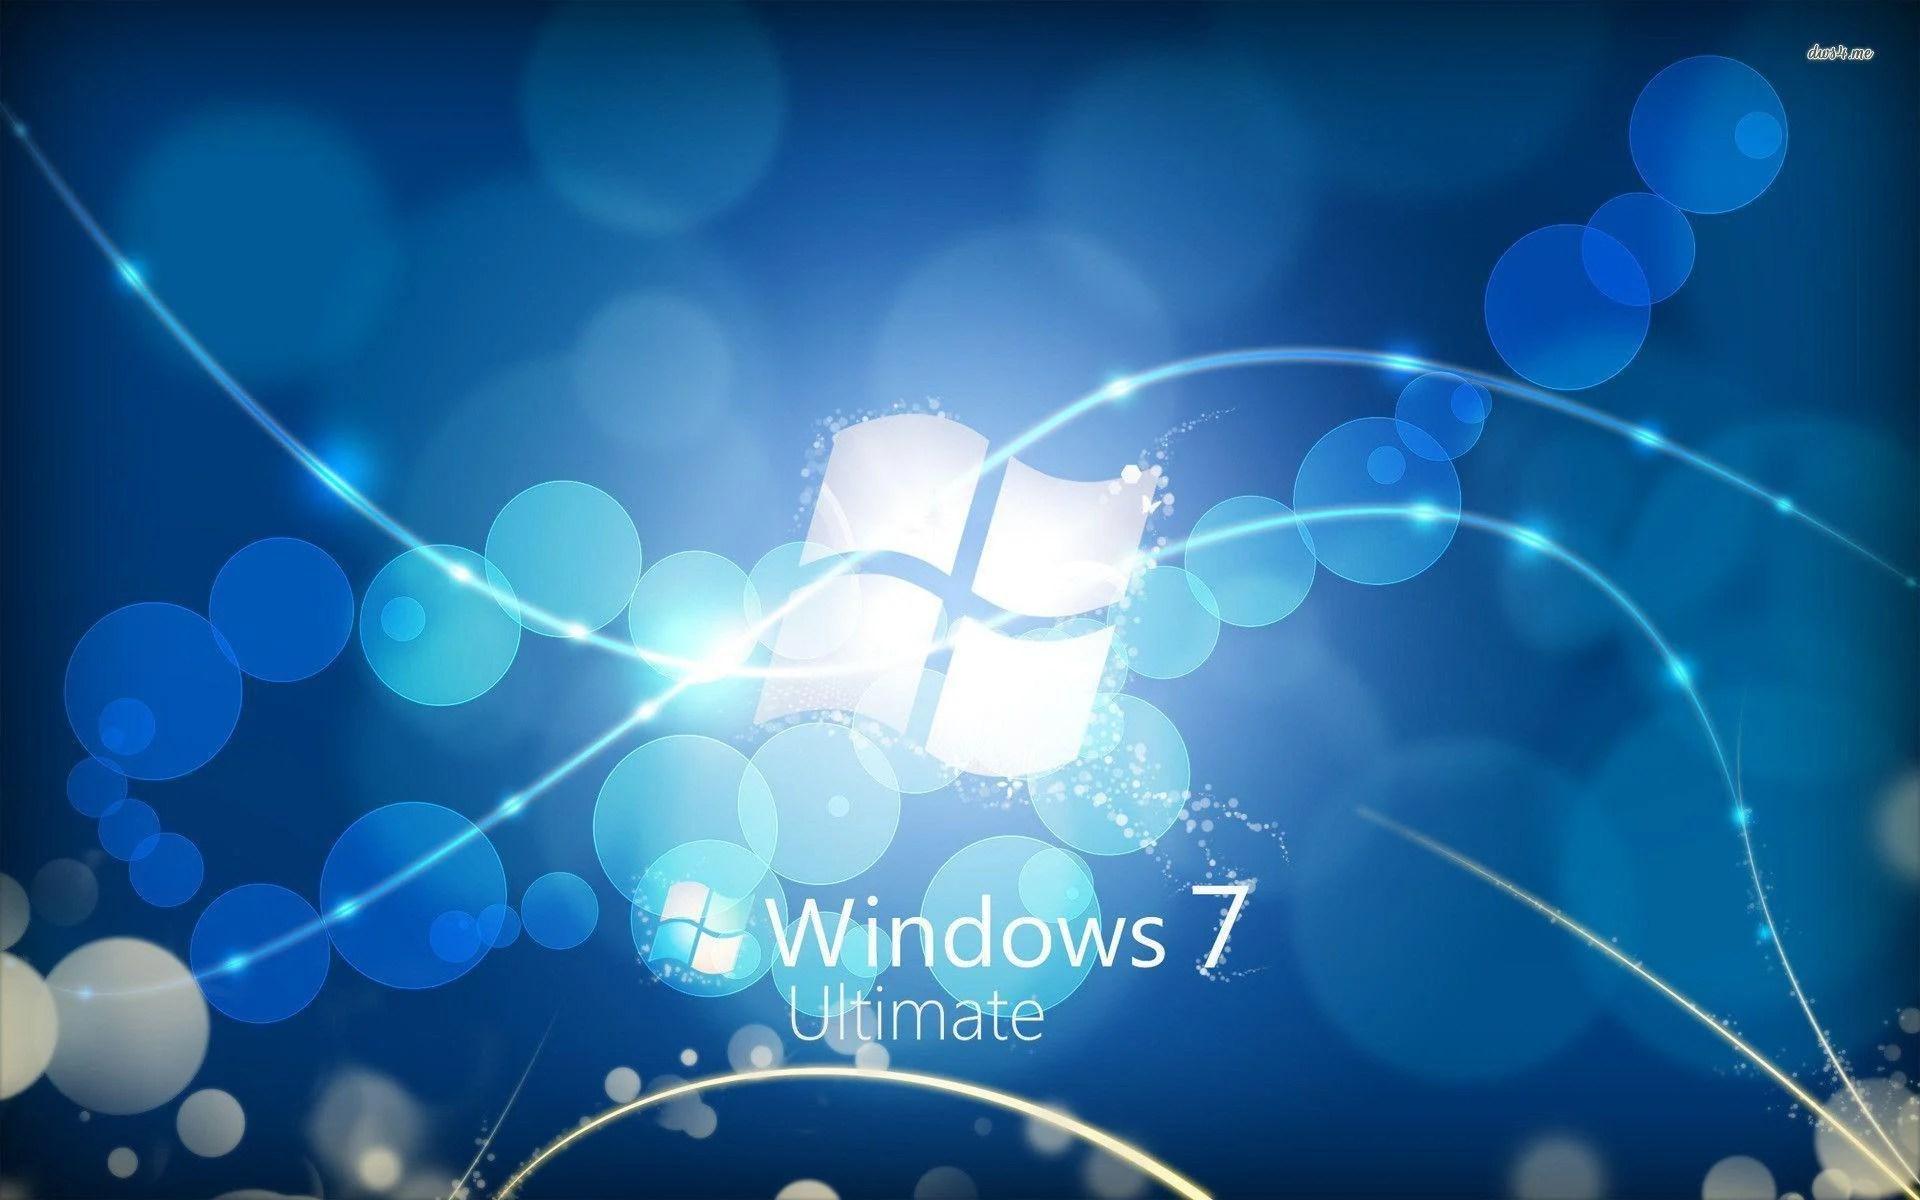 Windows 7 Ultimate Wallpaper 3d Windows 7 Ultimate Backgrounds Wallpaper Cave